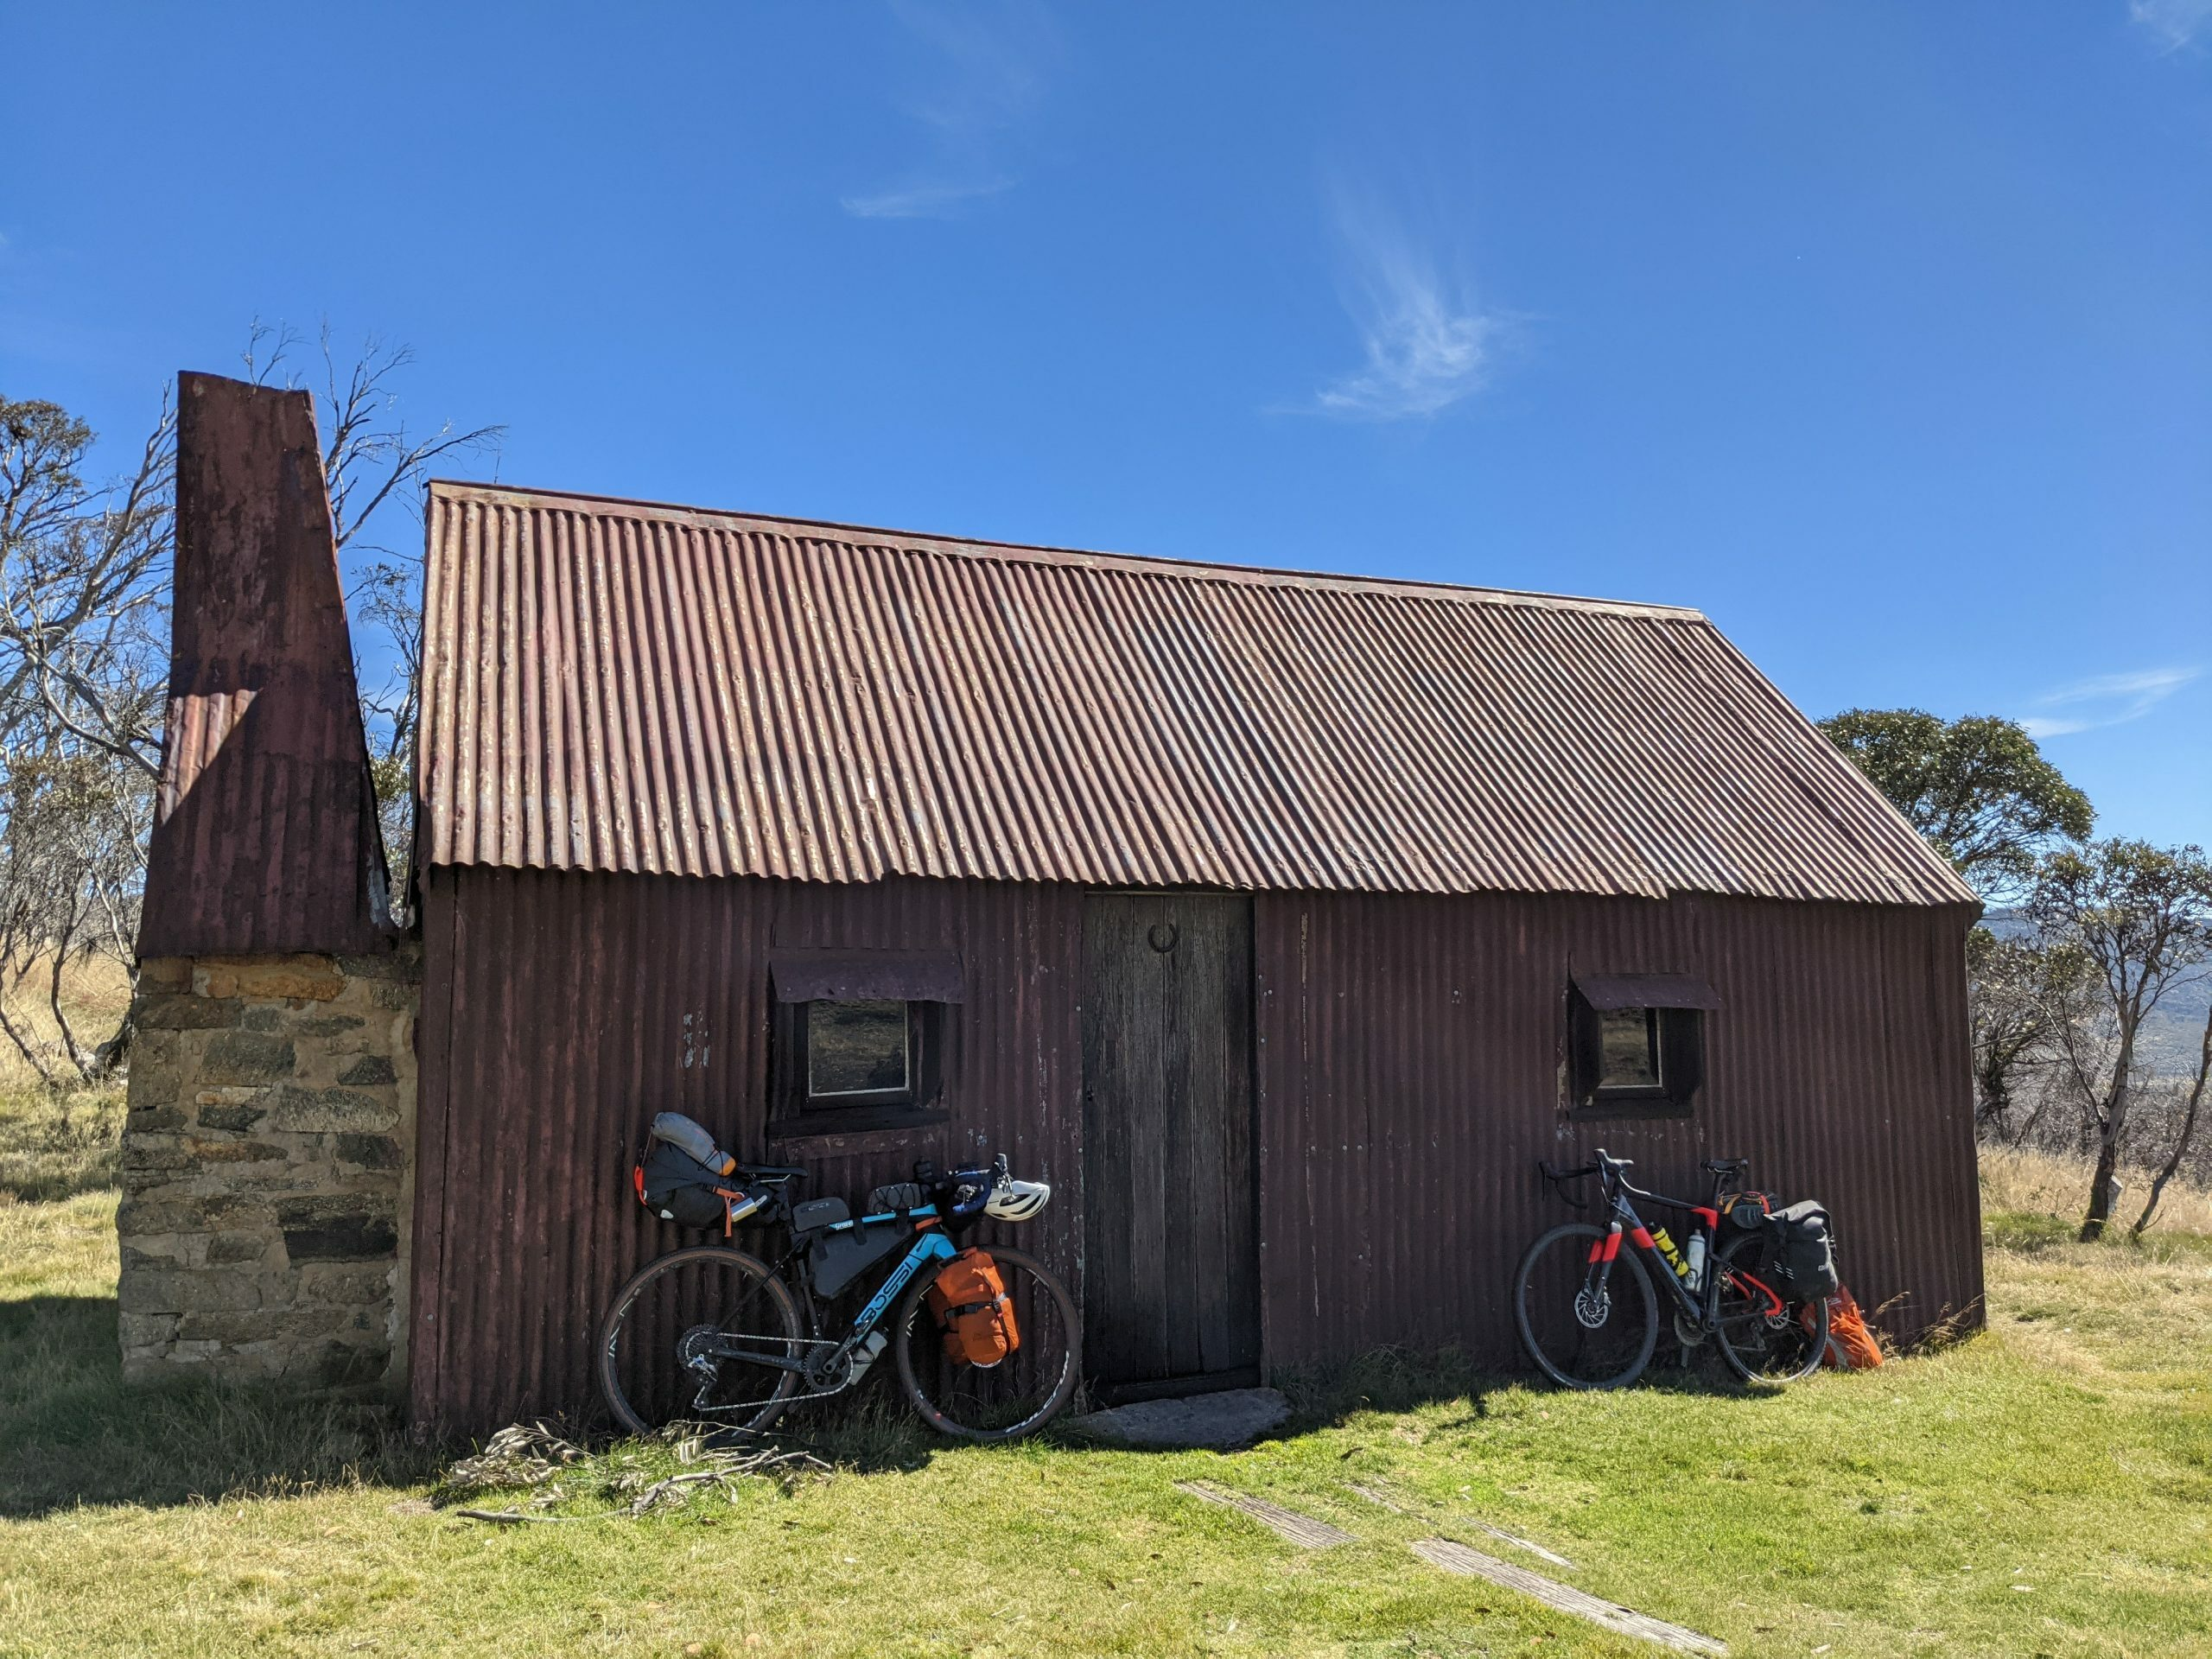 Easter bikepacking to Cesjacks Hut